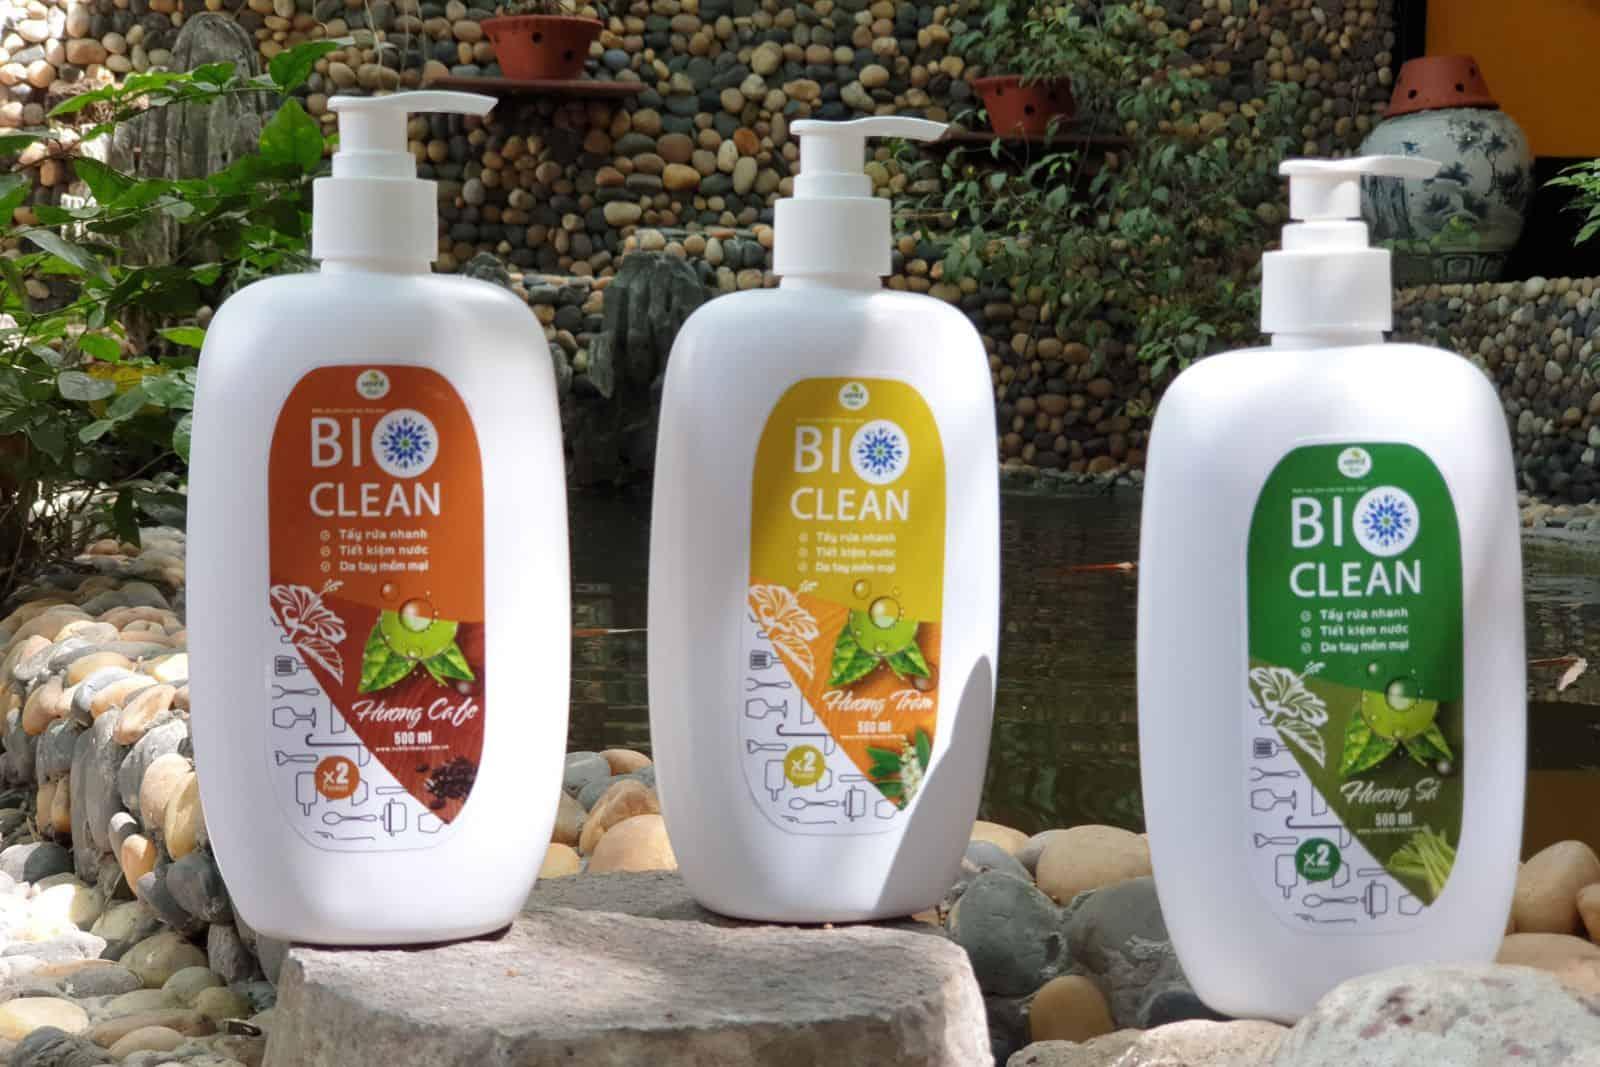 nước rửa chén sinh học BioClean